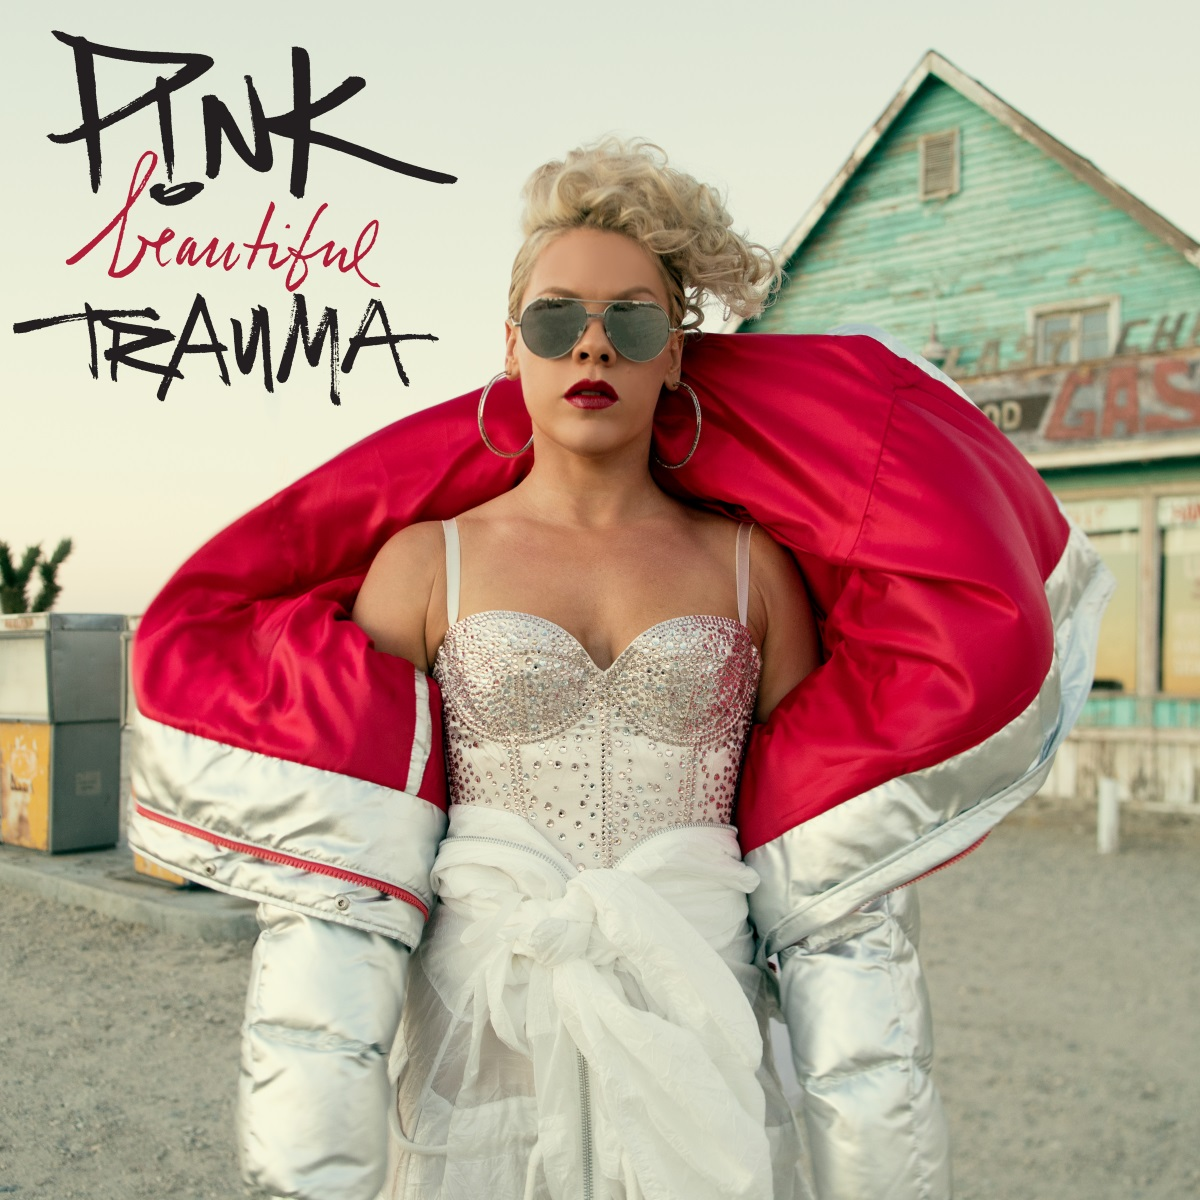 Album_der_Woche_ Pink_Beautiful_Trauma.jpg